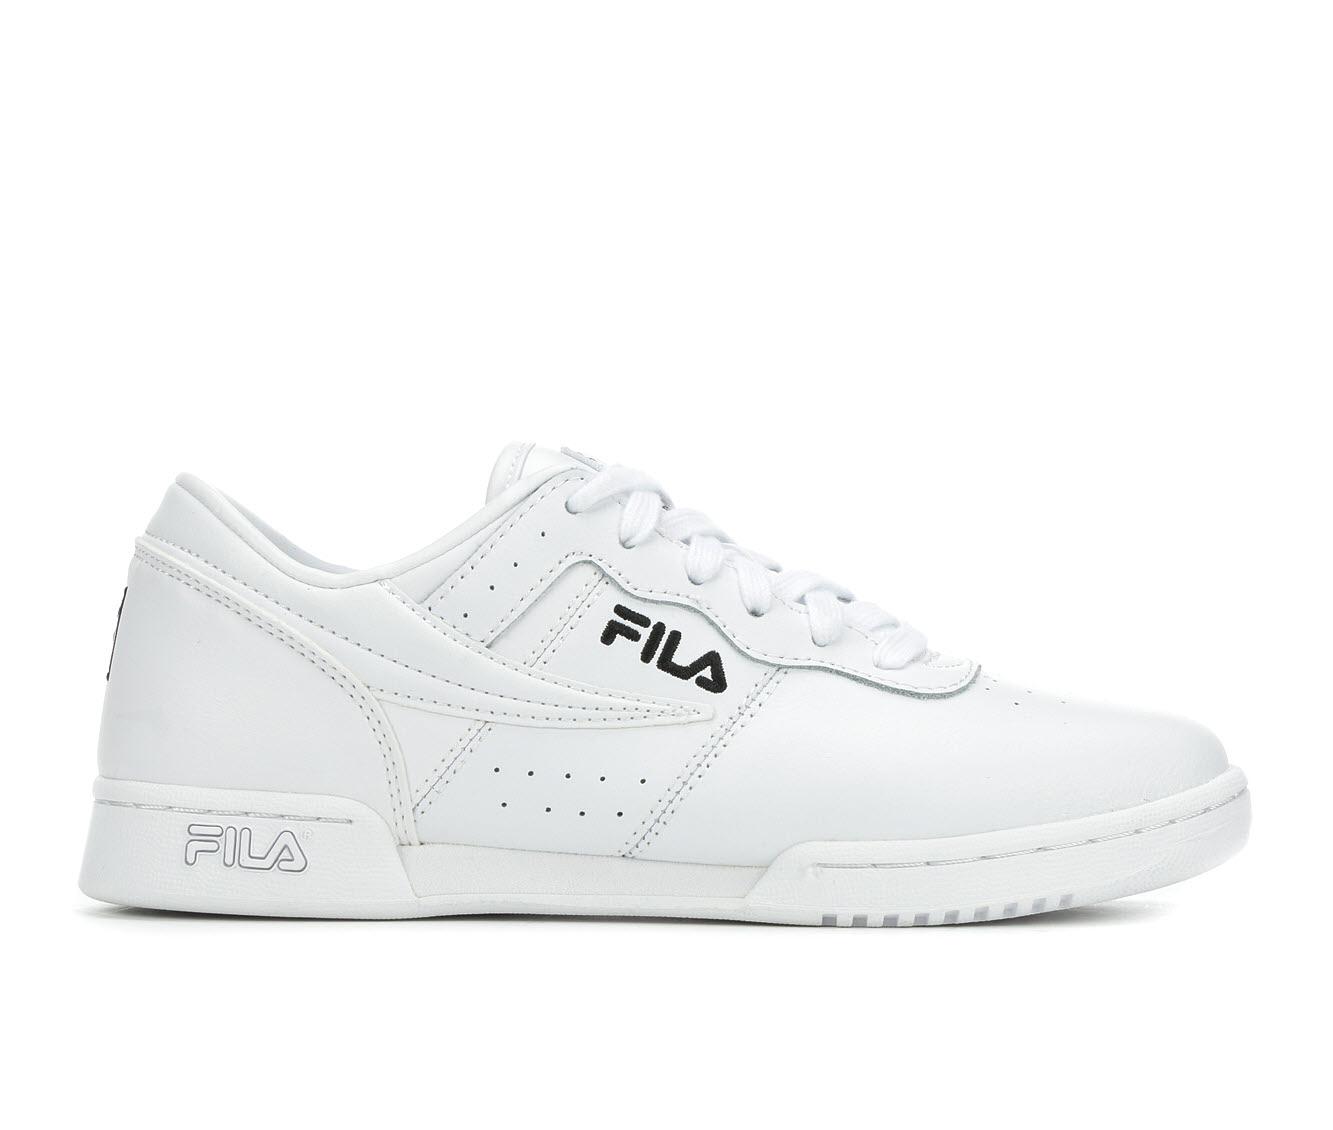 Fila Original Fitness Women's Athletic Shoe (White)